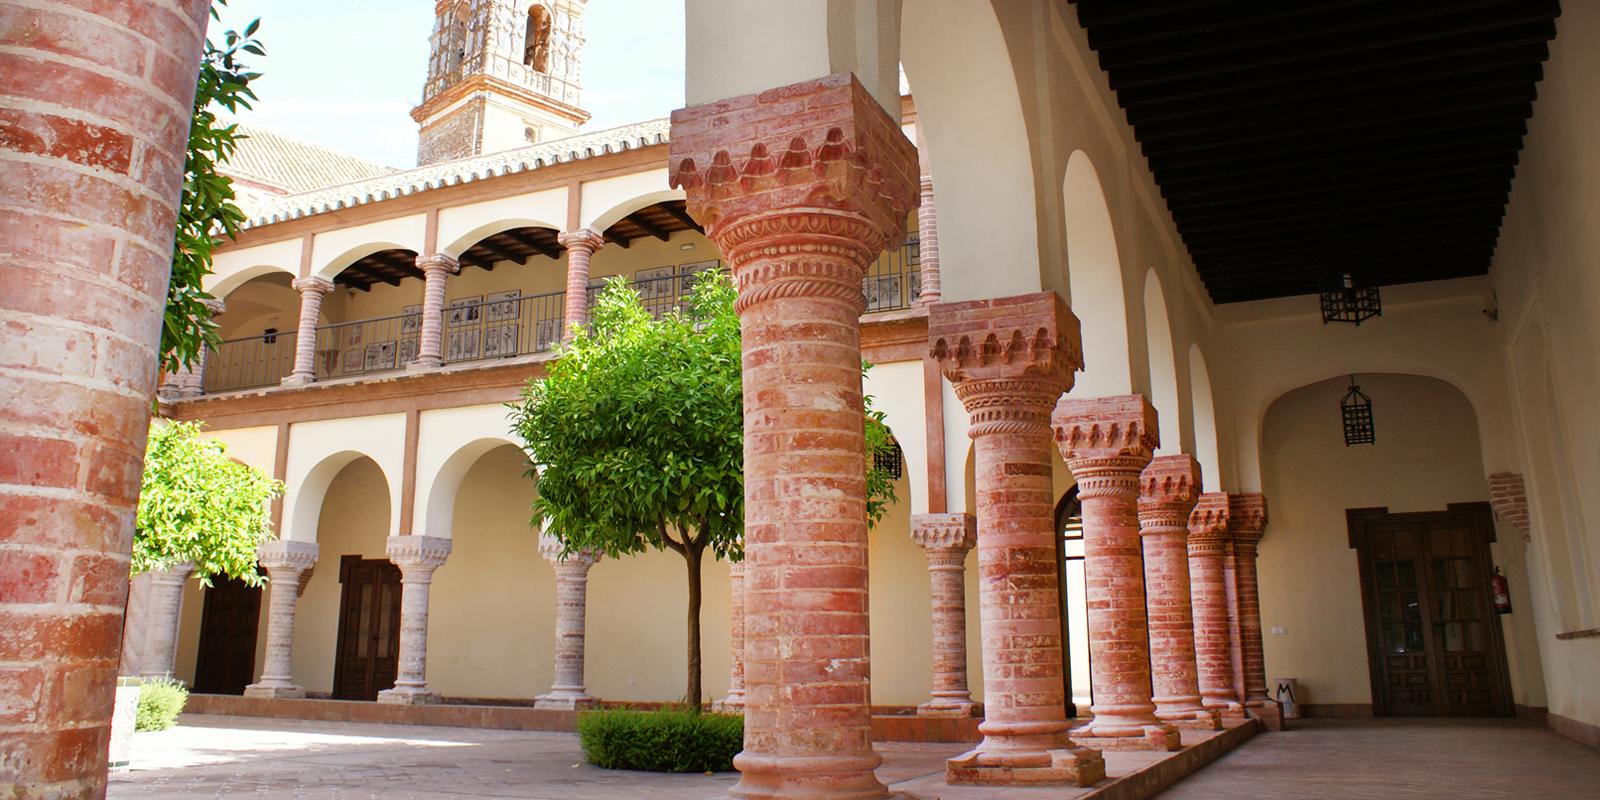 Hotel en Córdoba Convento de Santa Clara